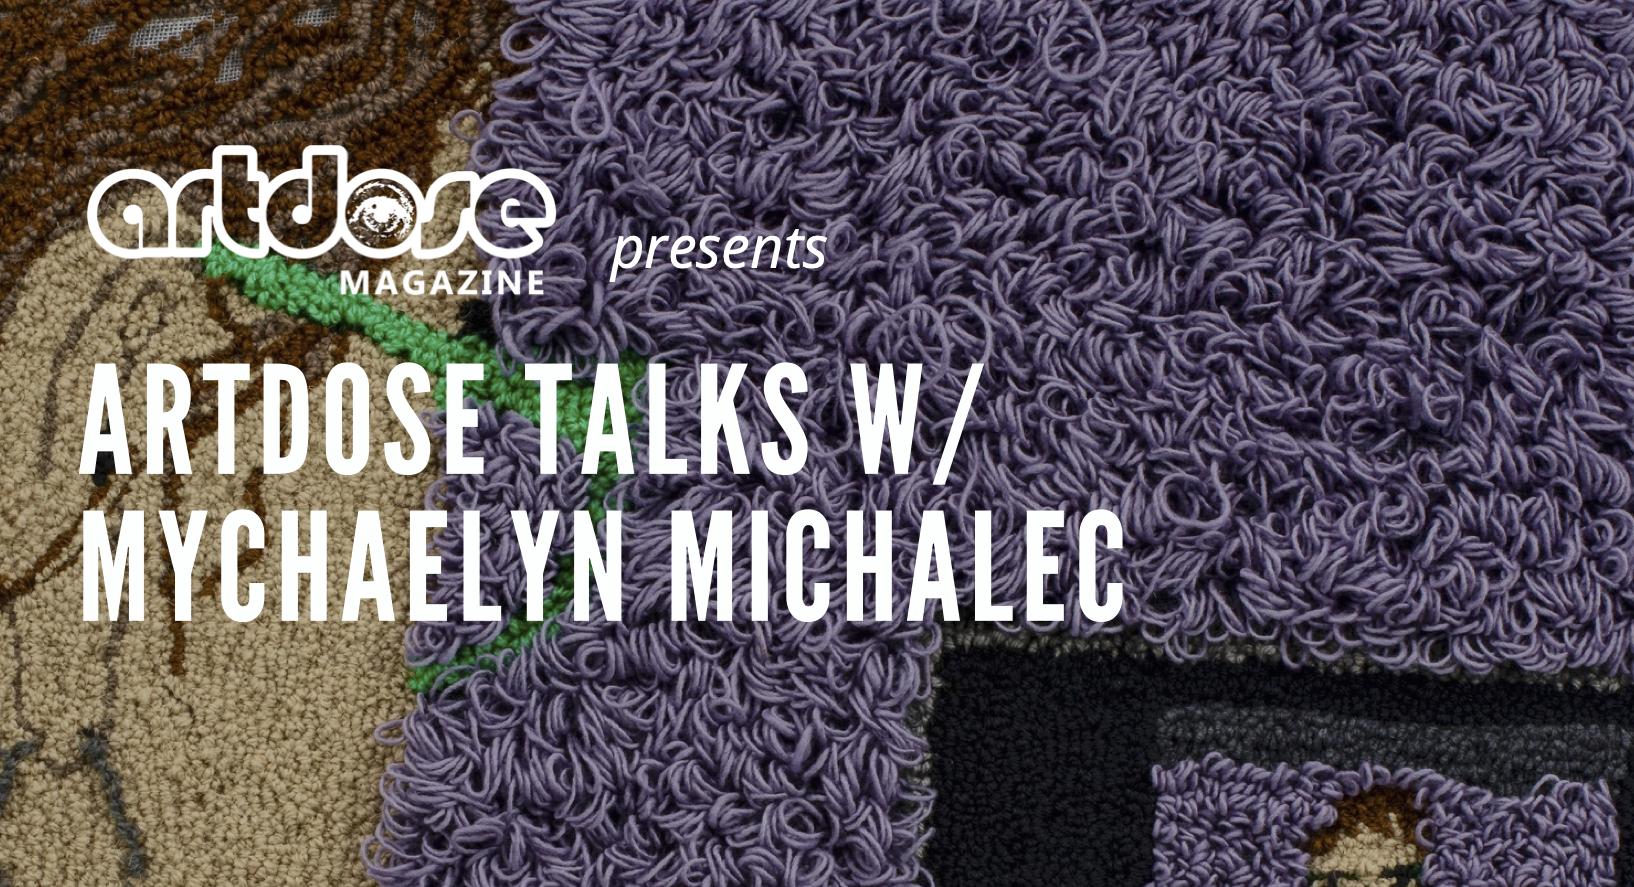 Artdose Talks with Textile Artist Mychaelyn Michalec